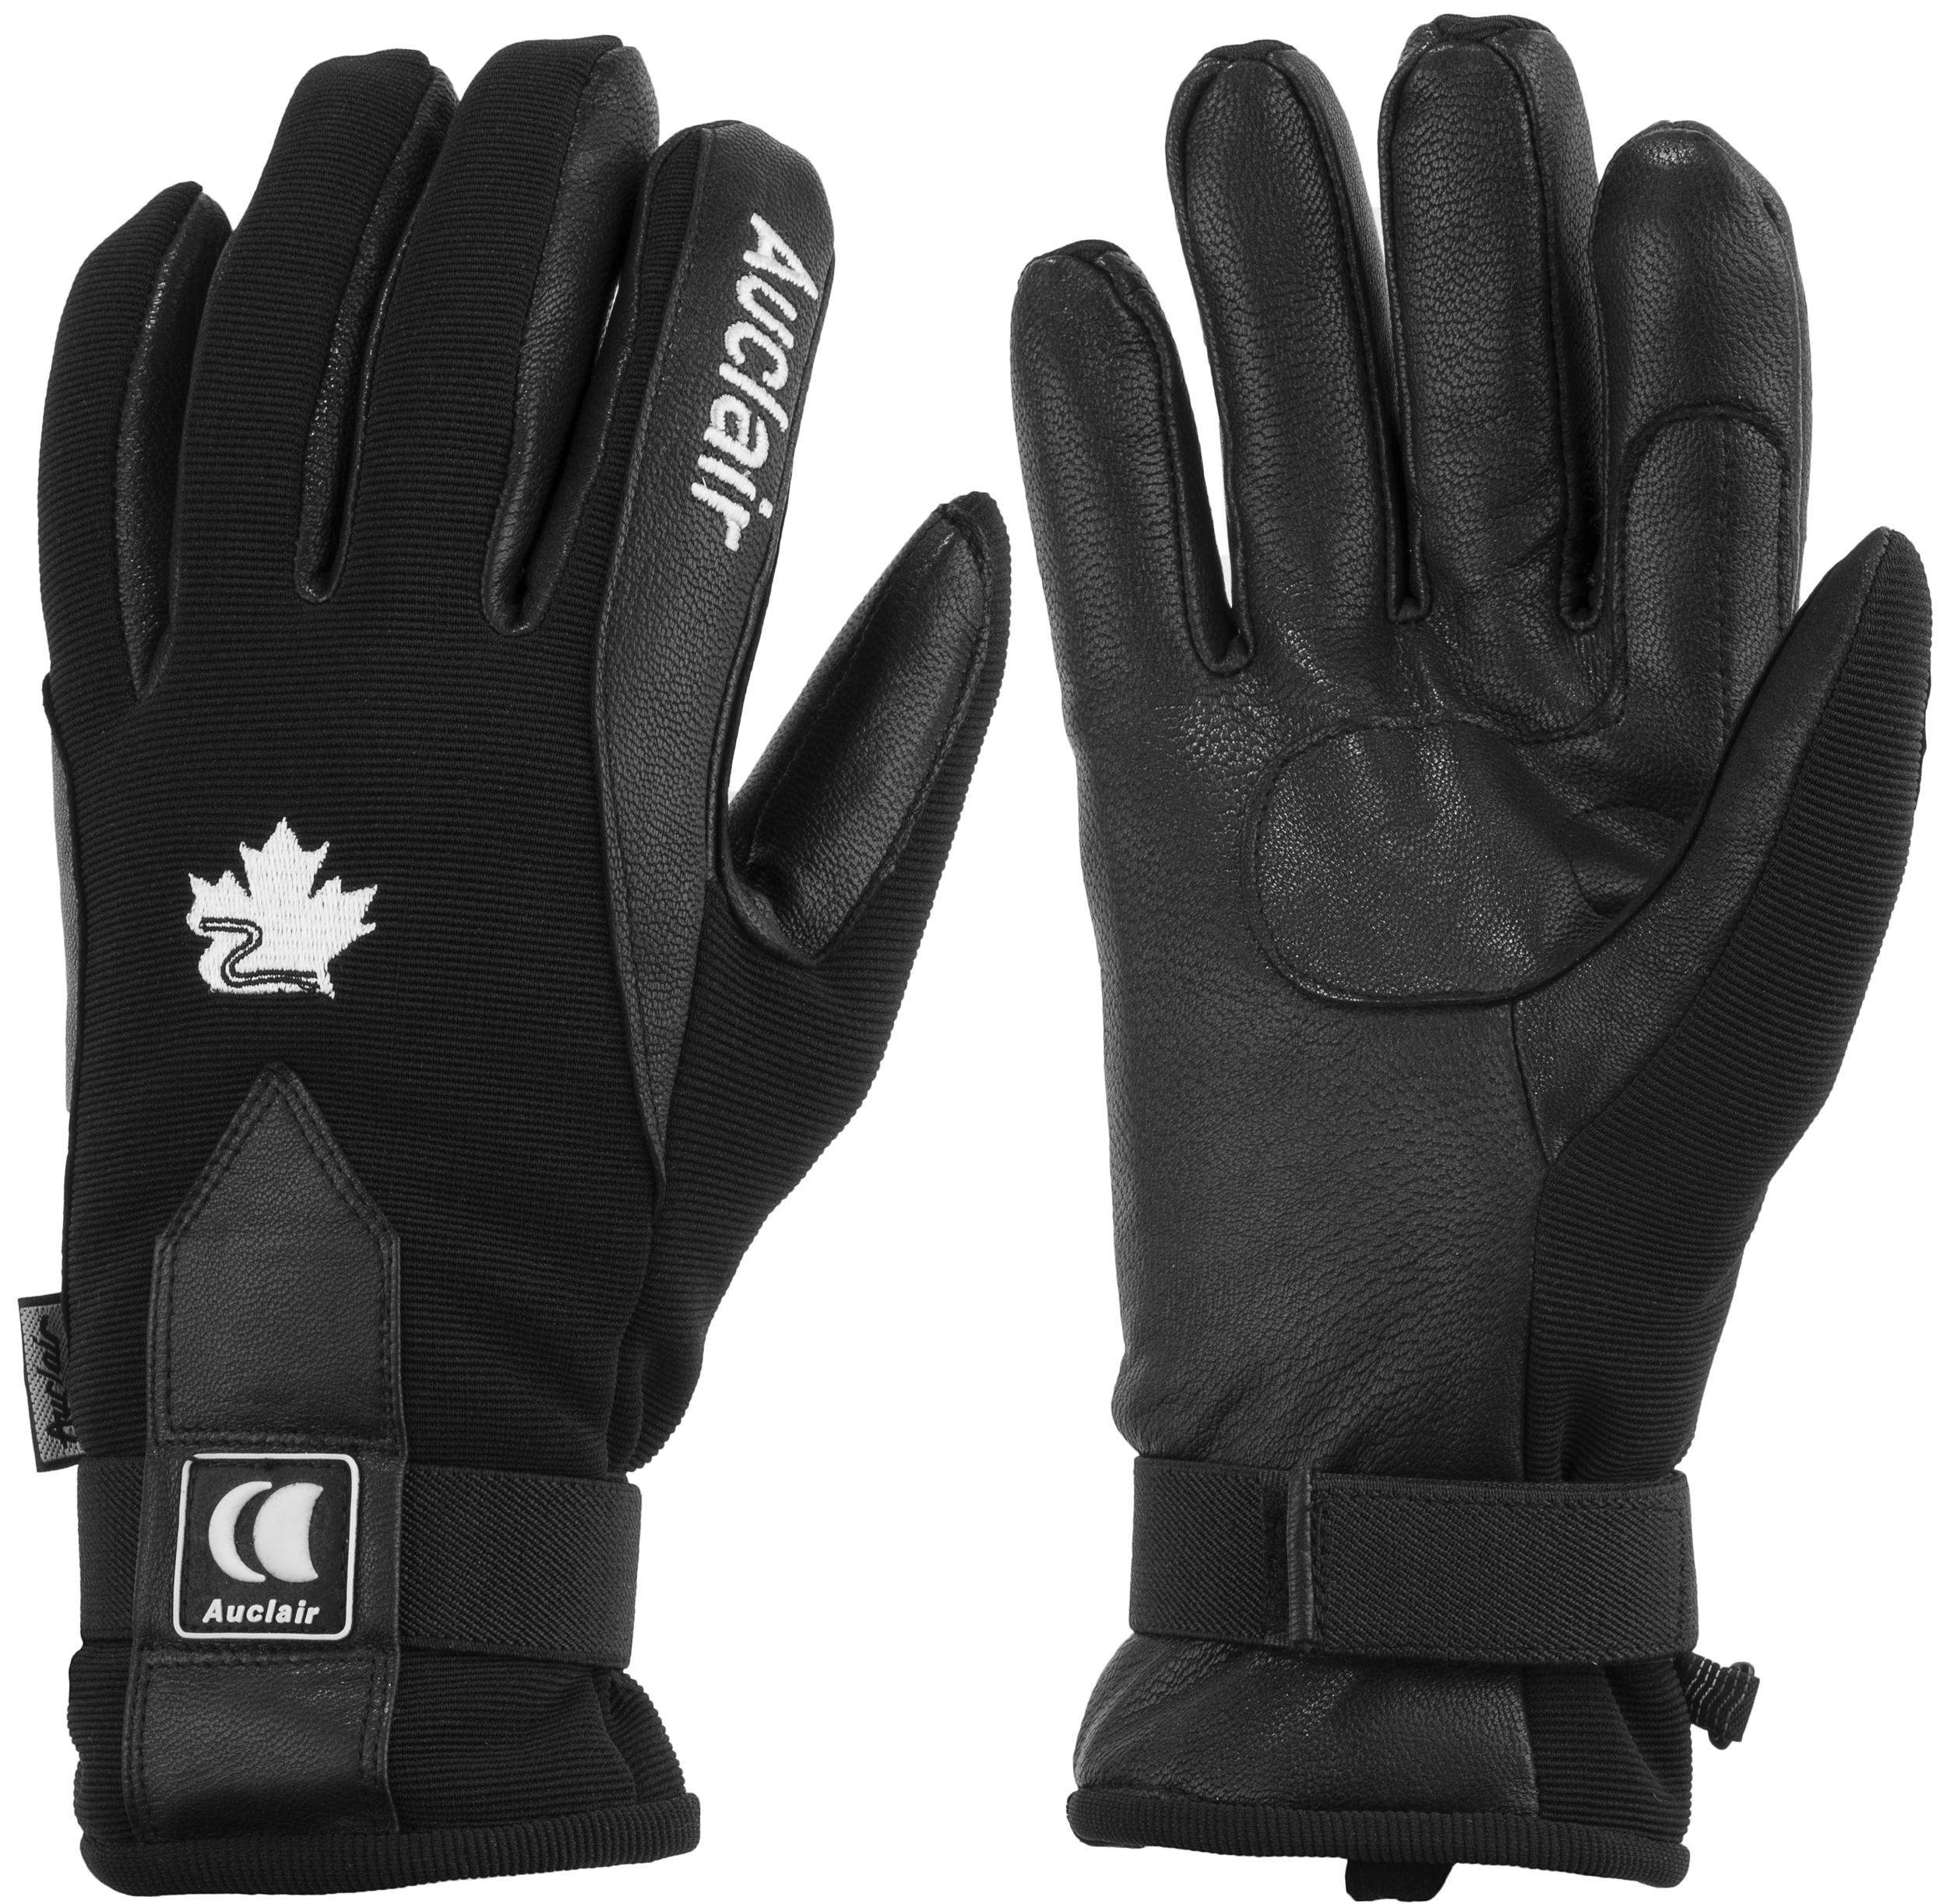 Driving gloves edmonton - Driving Gloves Edmonton 18